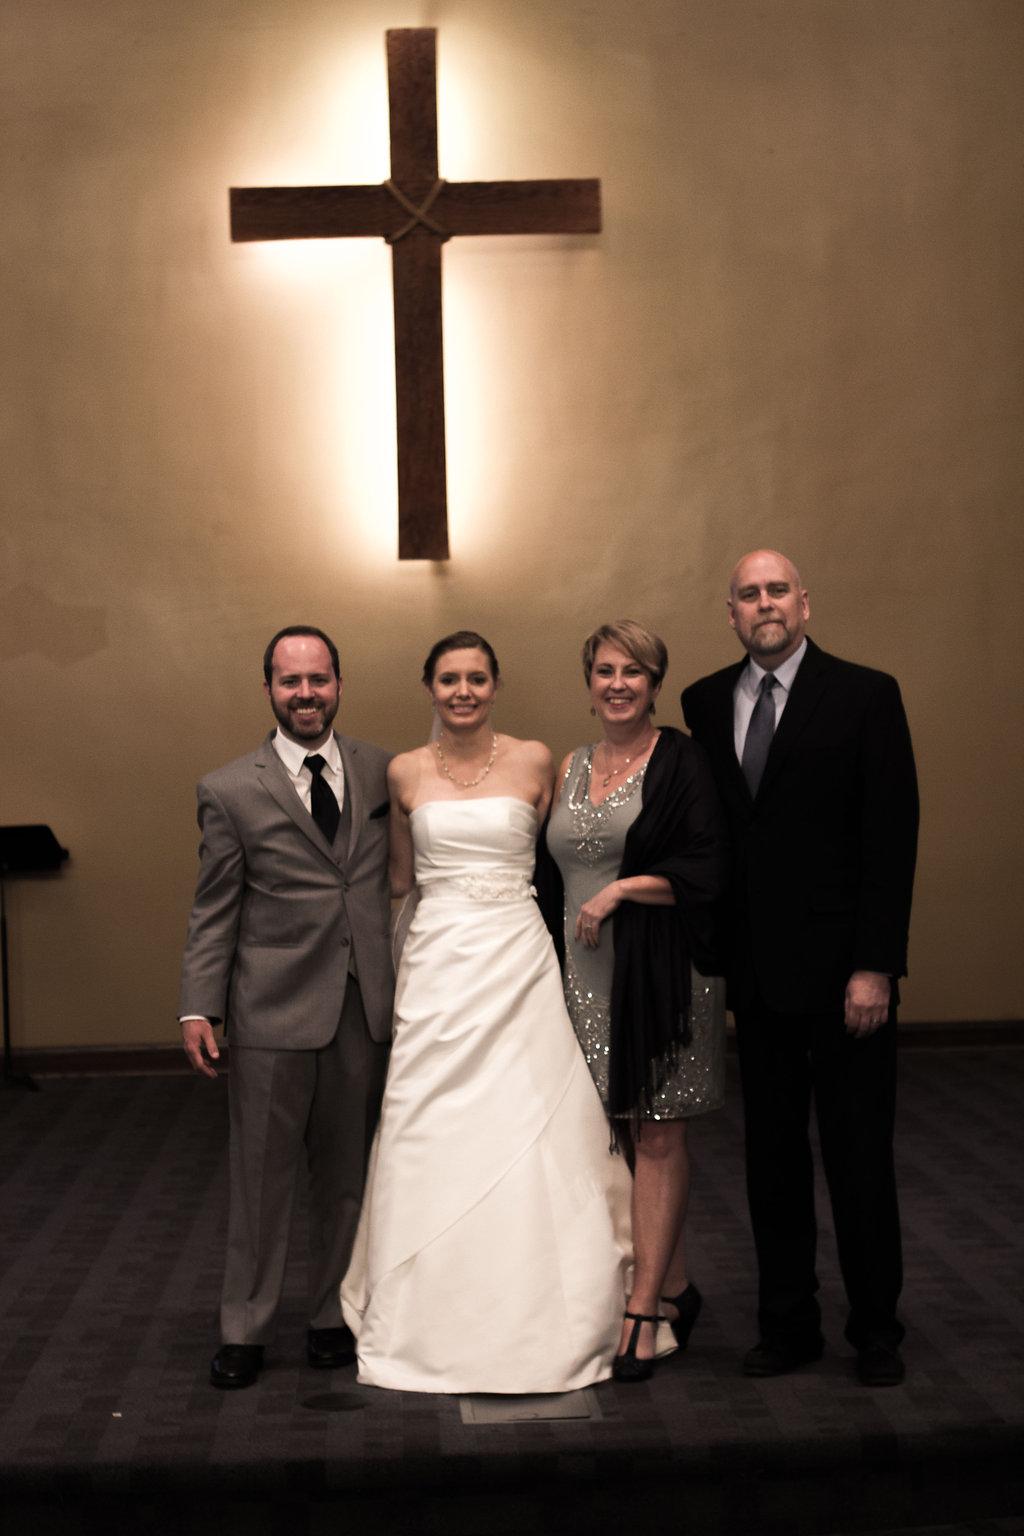 jakeandsuze_weddingselects-124.jpg